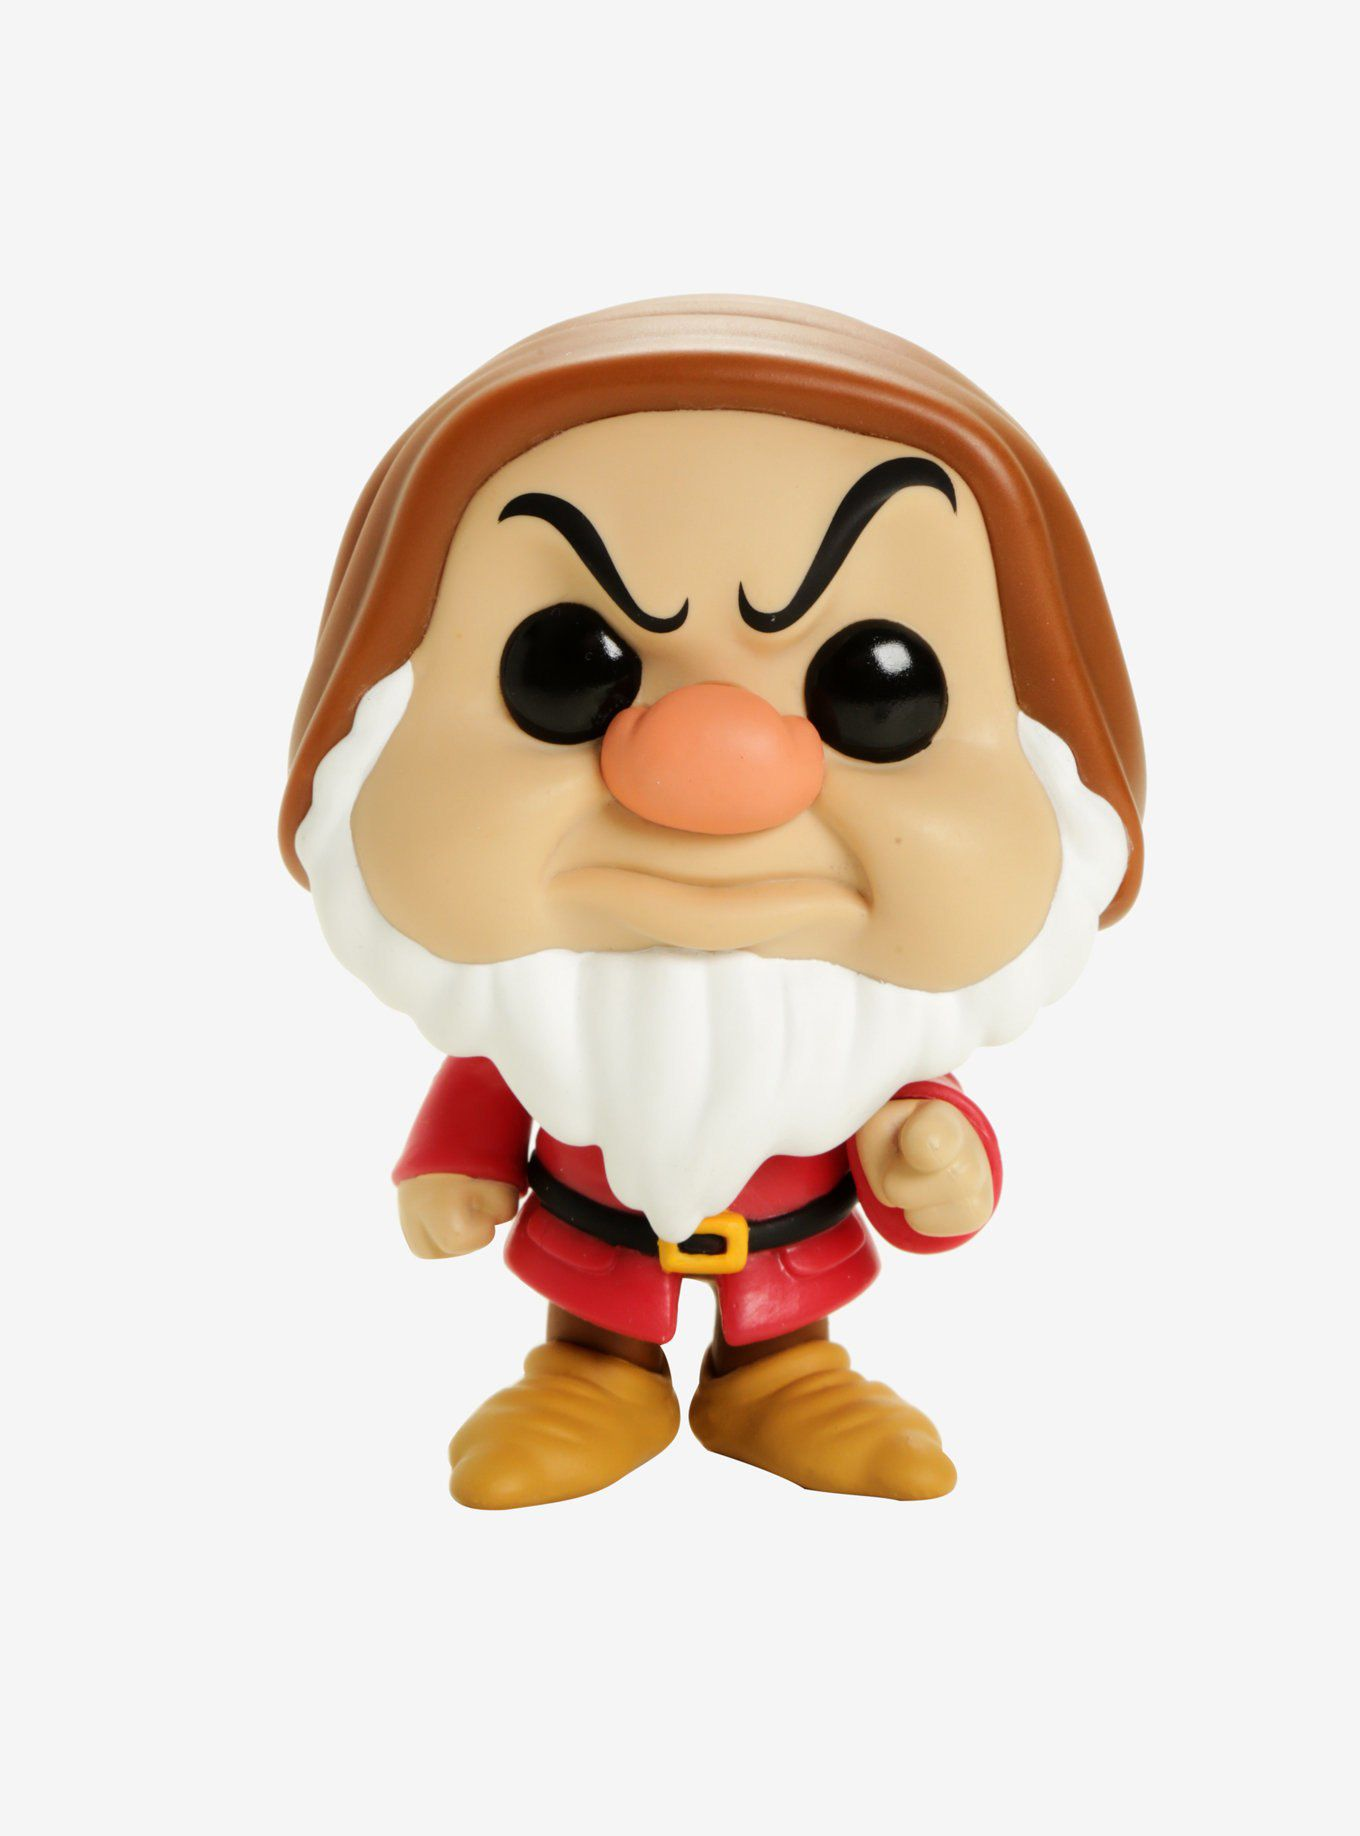 Grumpy #345 ( Zangado ) - Snow White ( Branca de Neve ) - Funko Pop! Disney